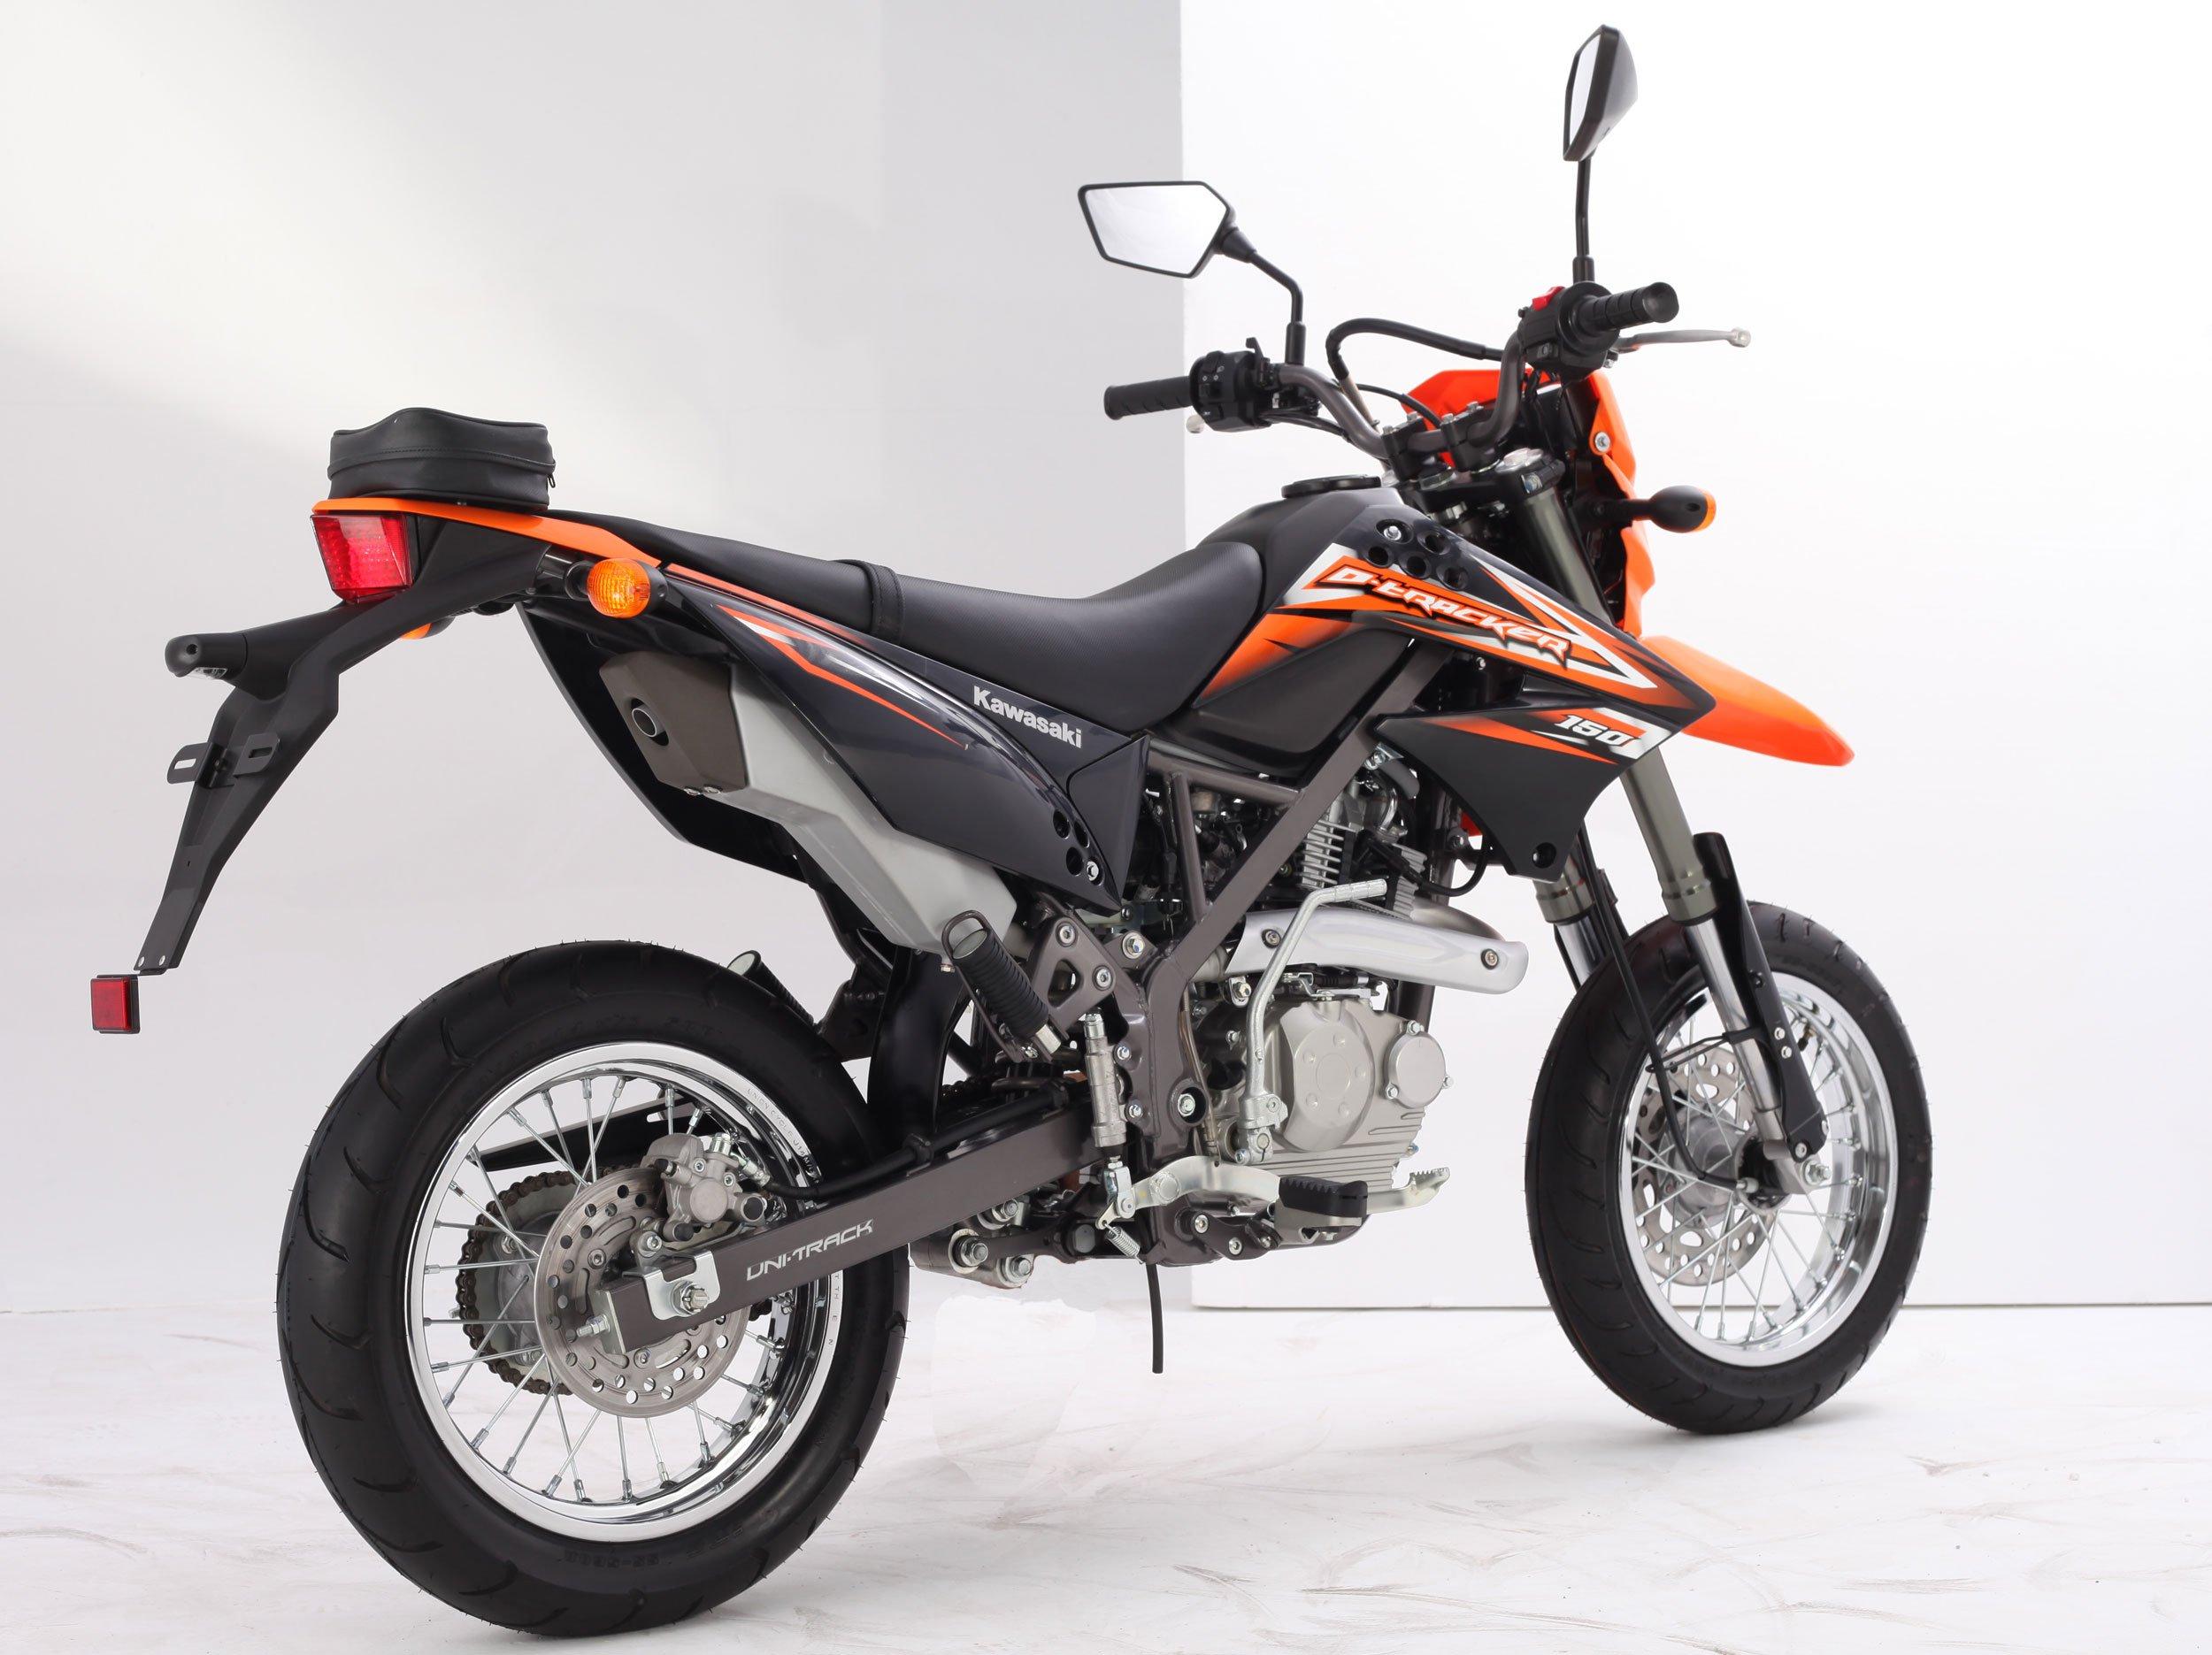 kawasaki d-tracker 150 launched, priced at rm9,689